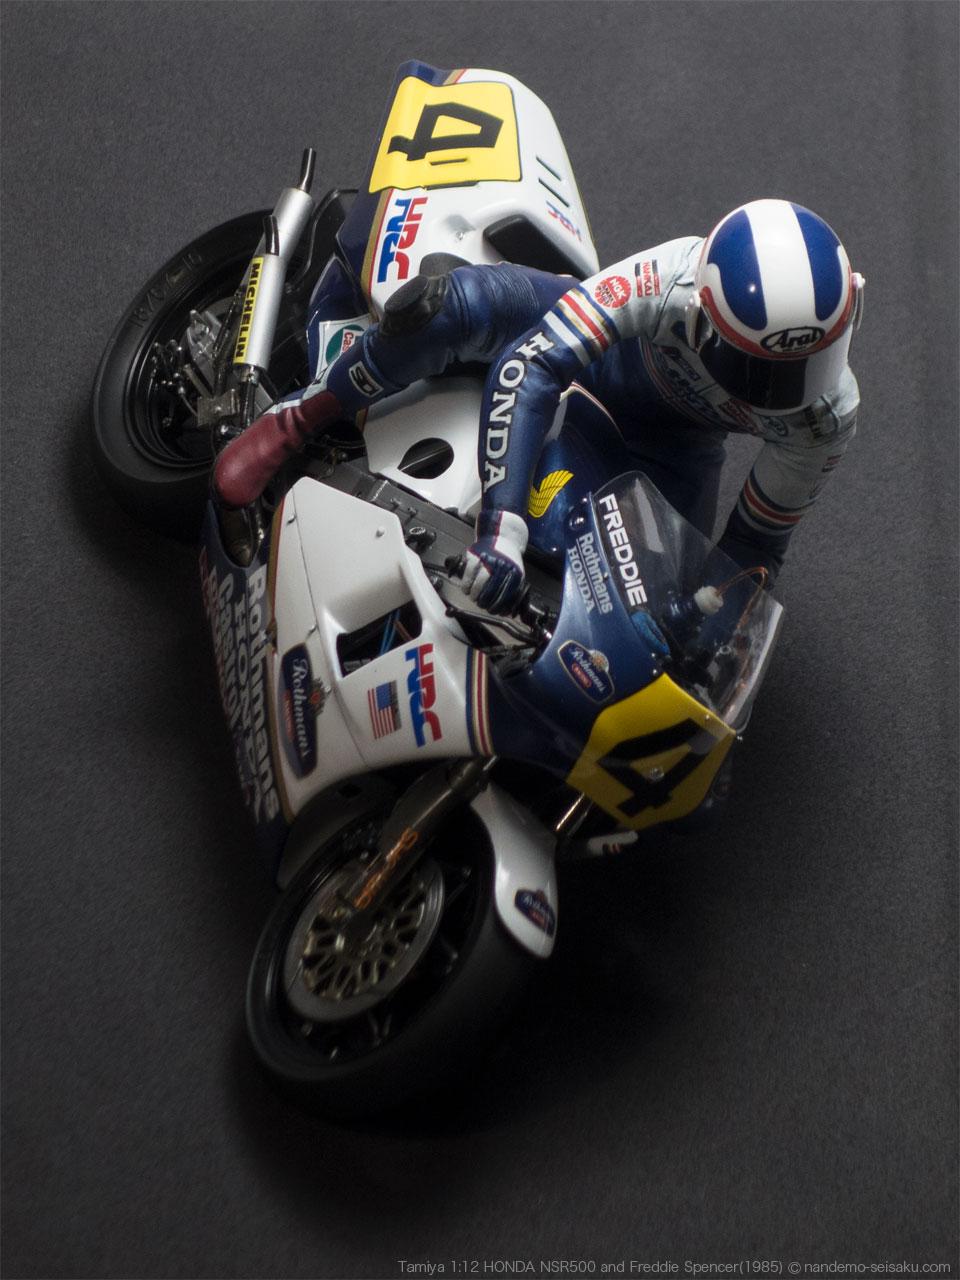 NSR500 and Freddie Spencer 1985